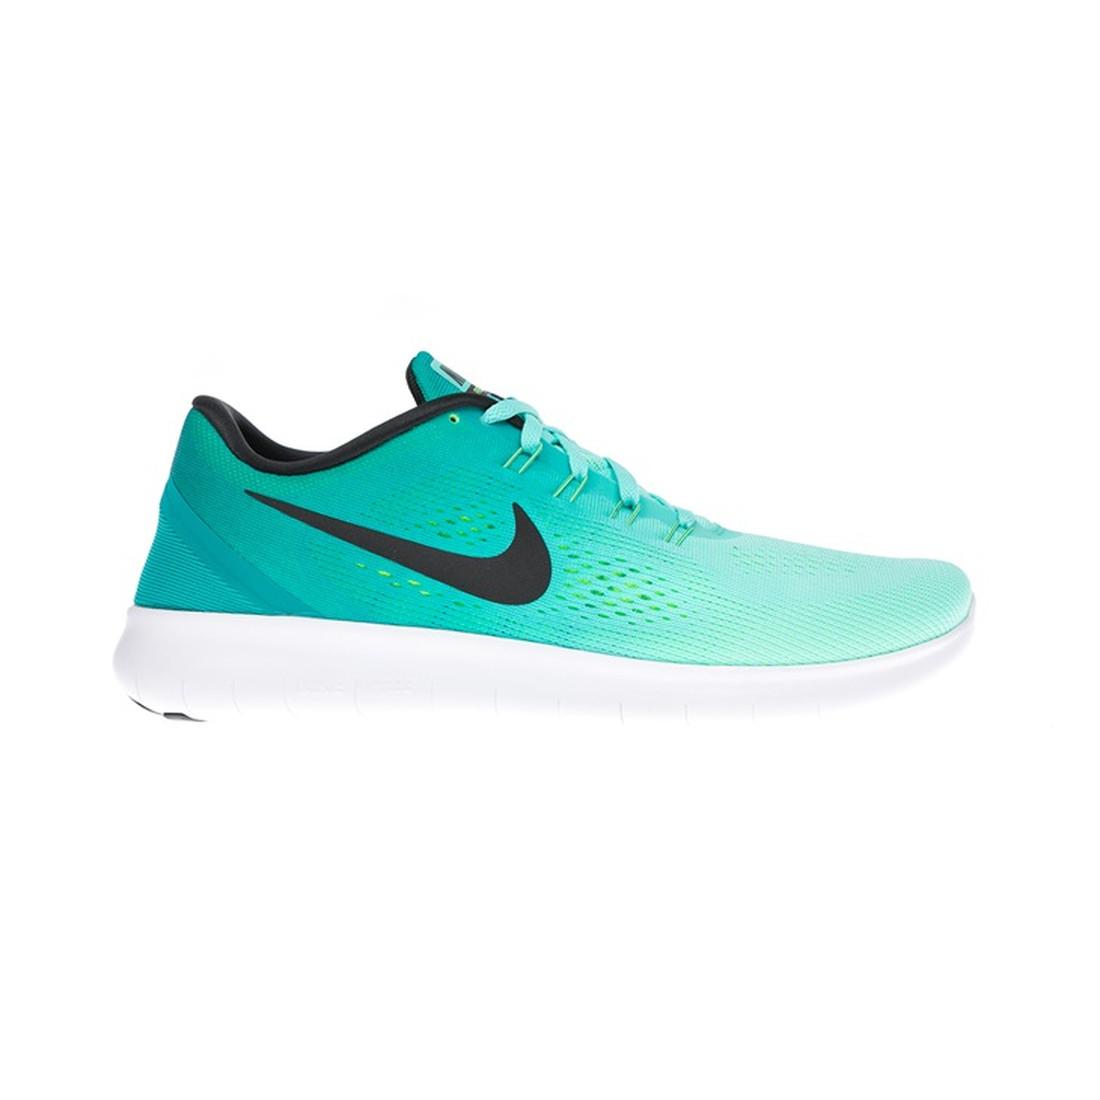 Running αθλητικά από τη Nike σε εκπλητική τιμή